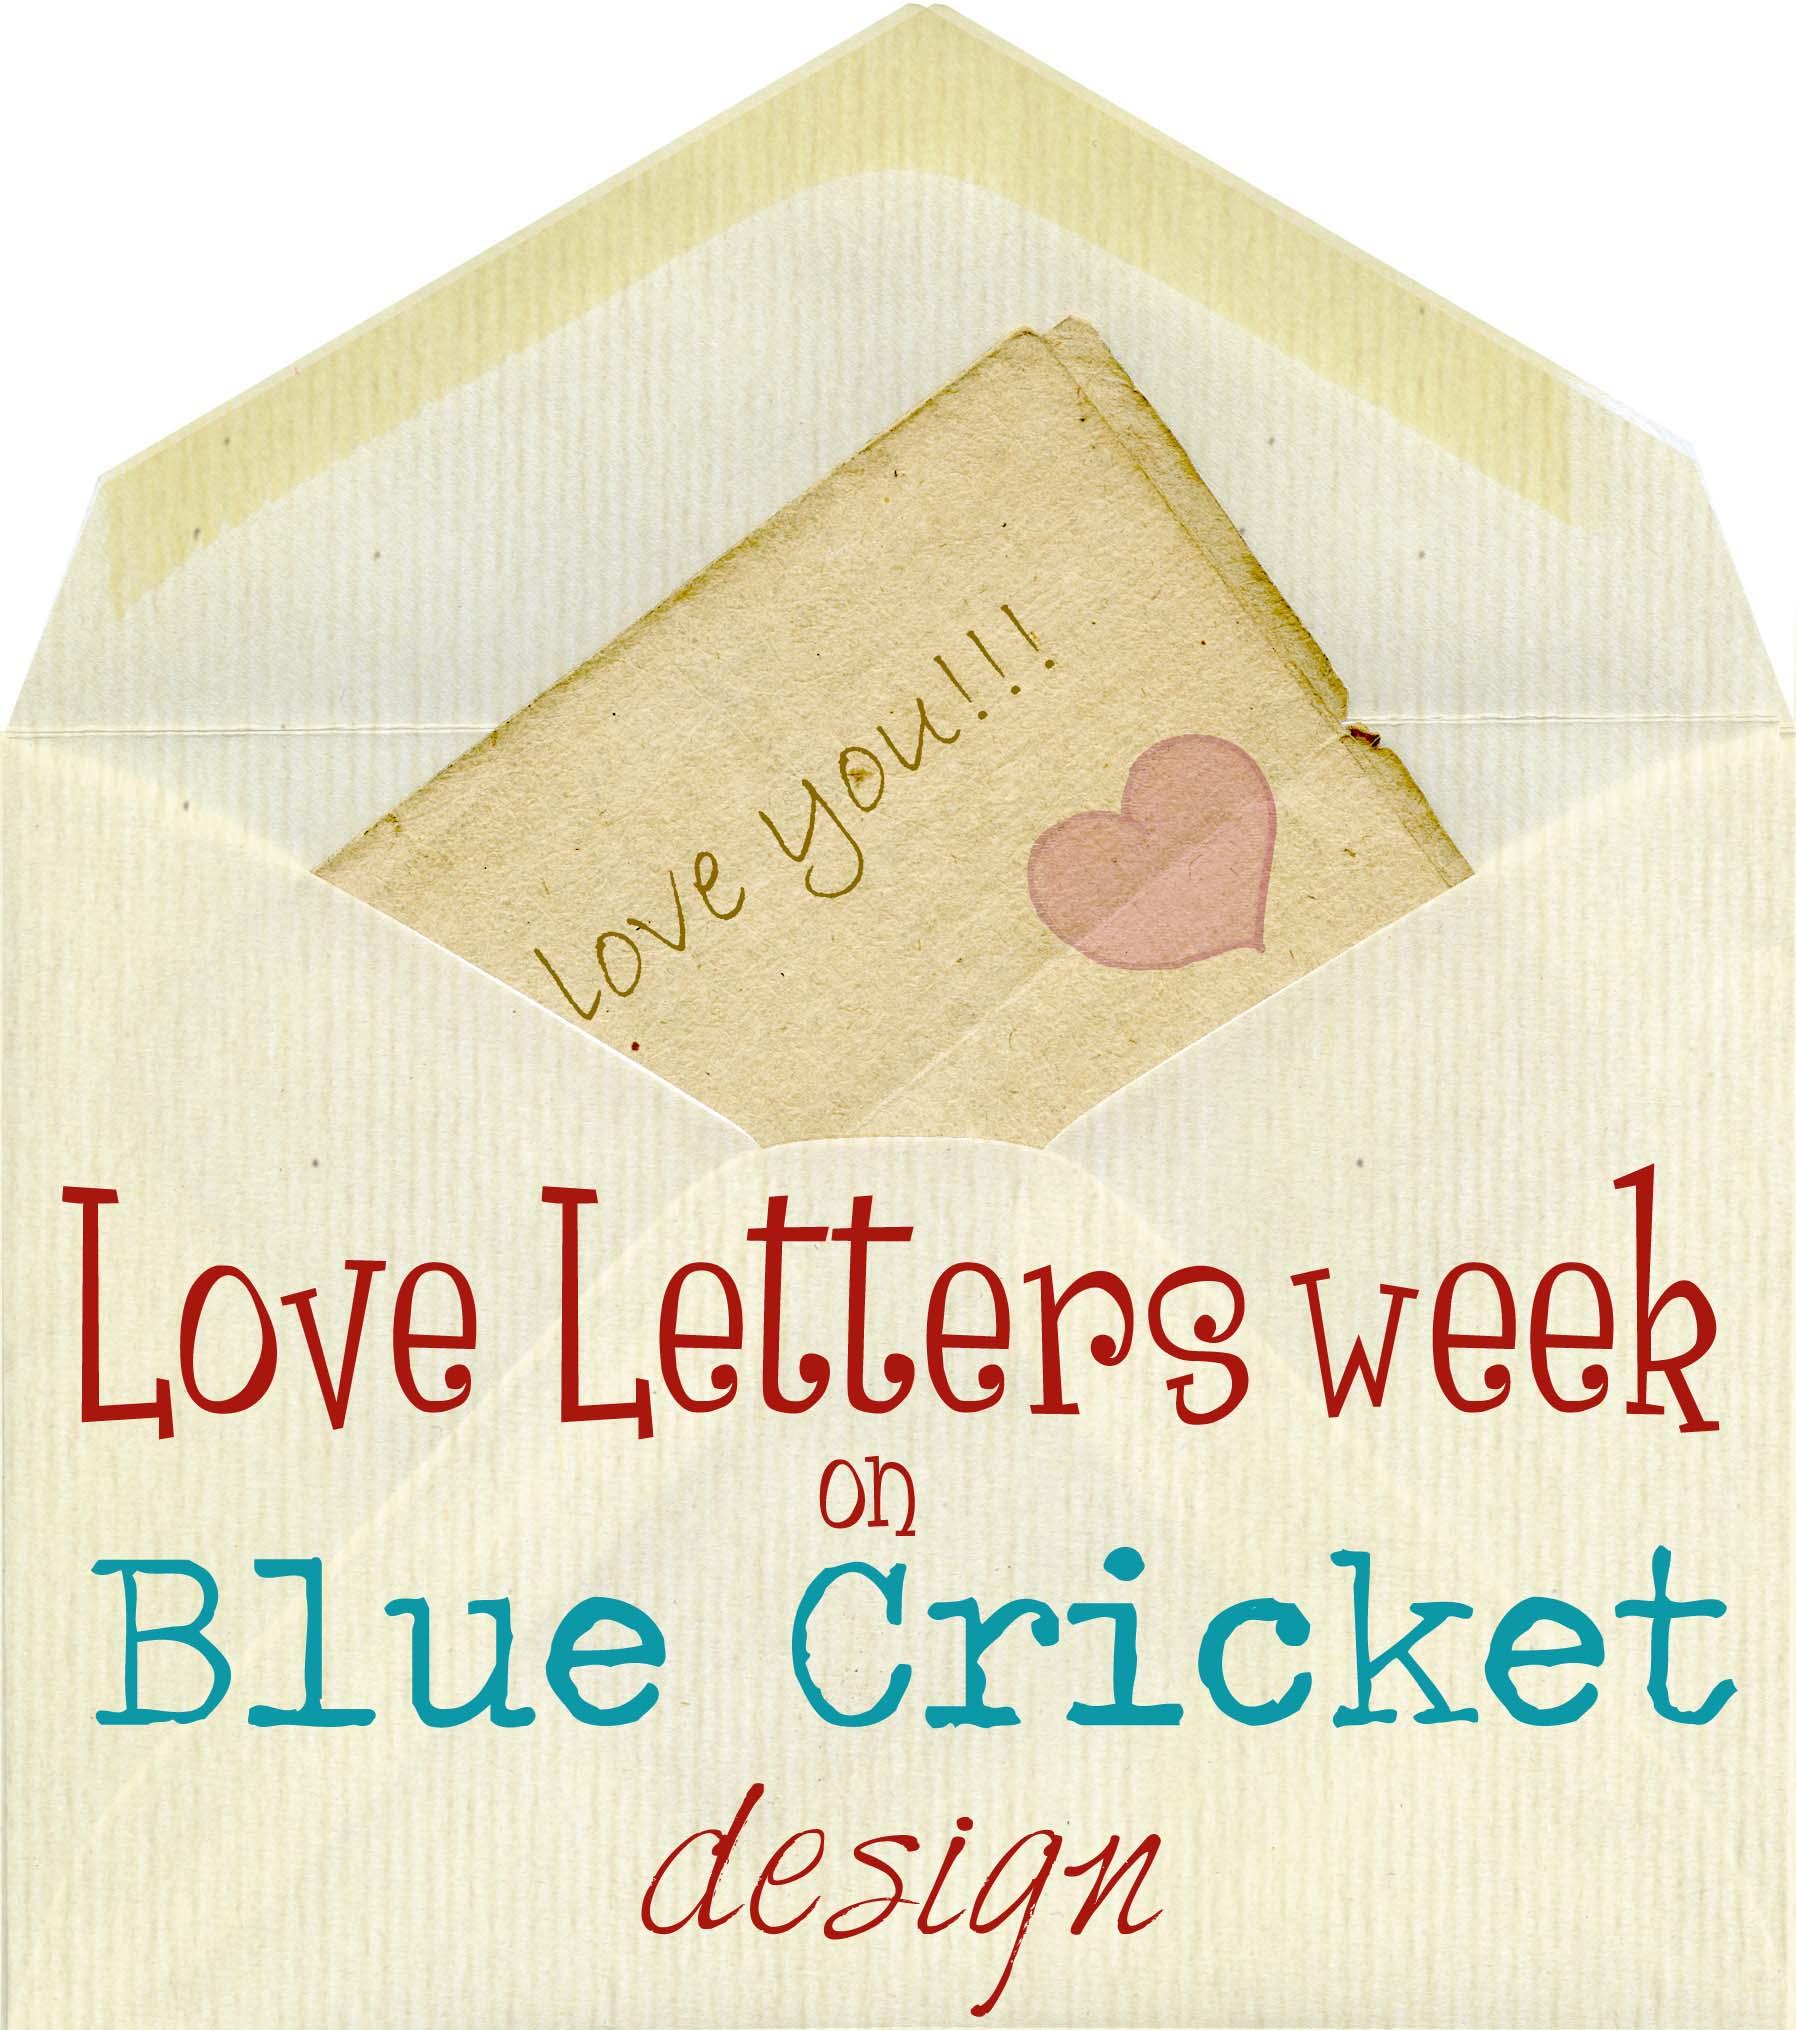 Love Letters Week!